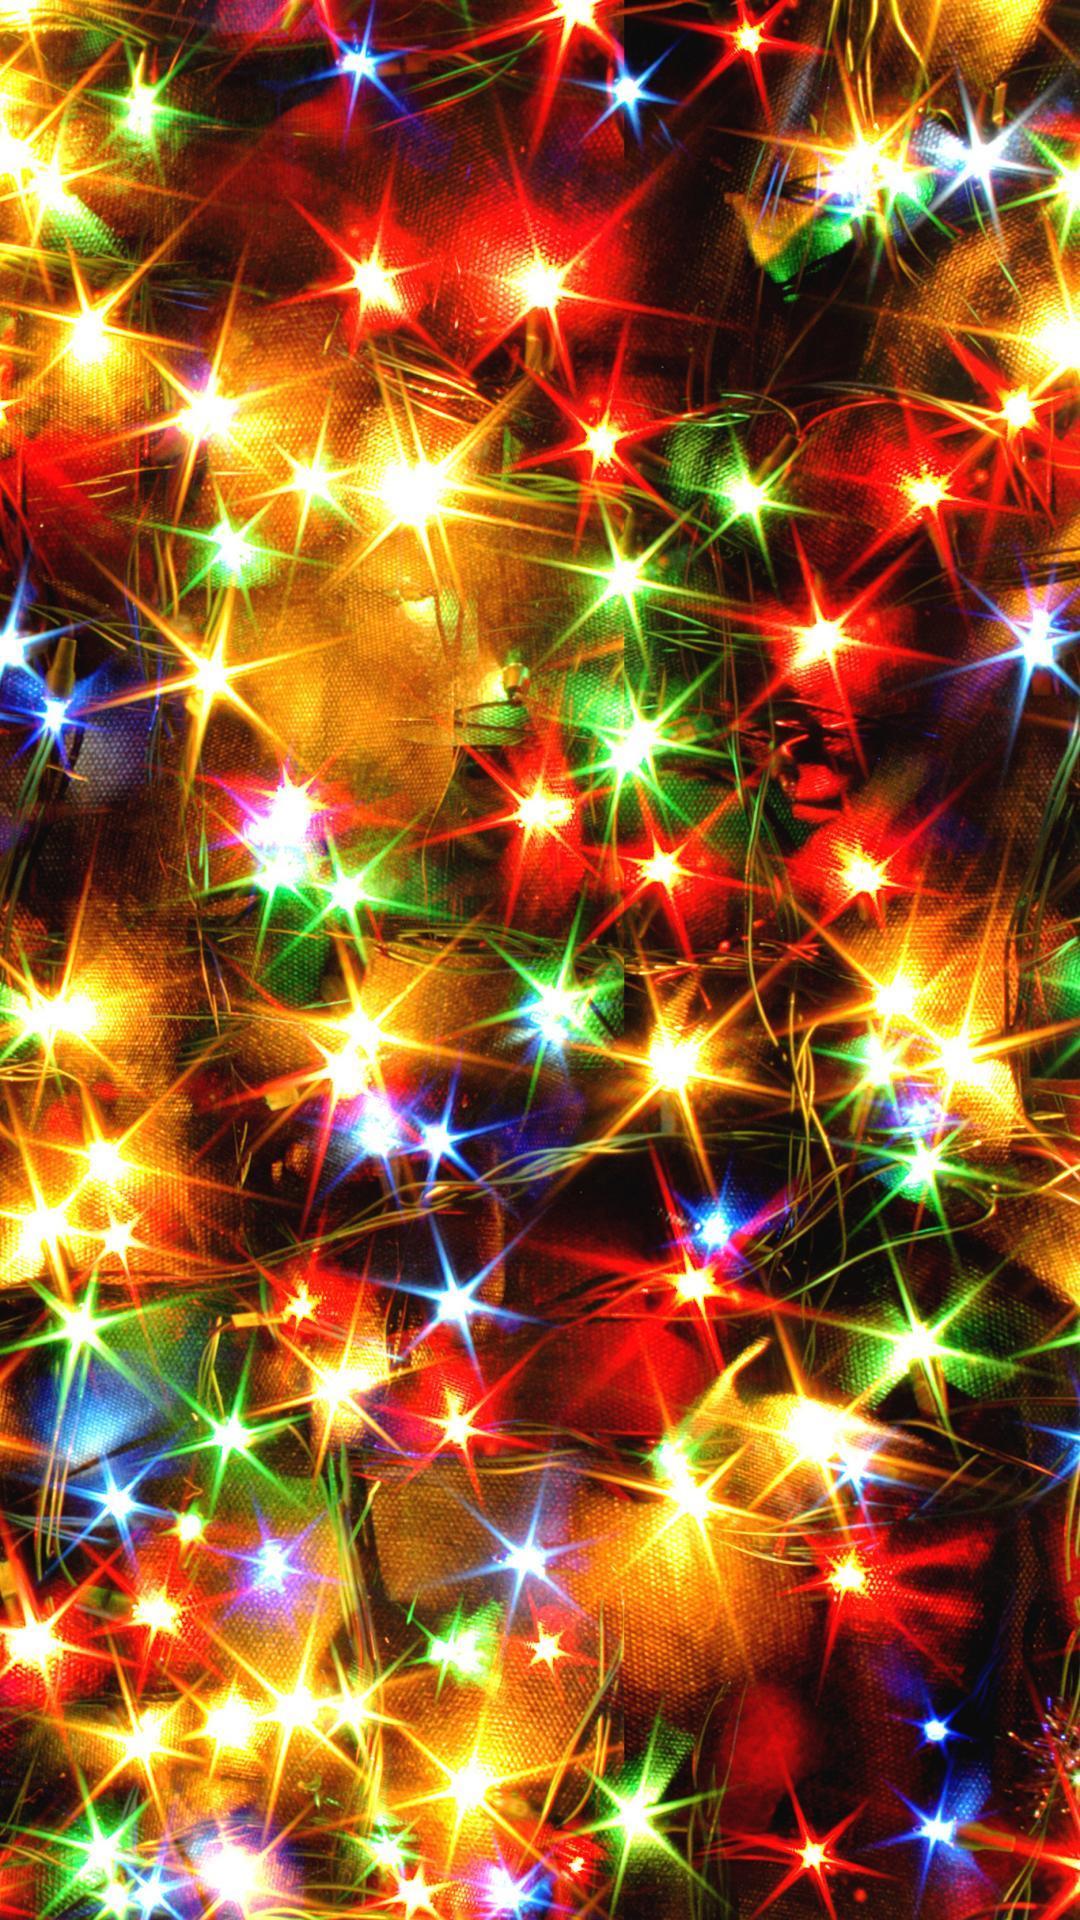 HD Christmas Lights Wallpapers - Wallpaper Cave